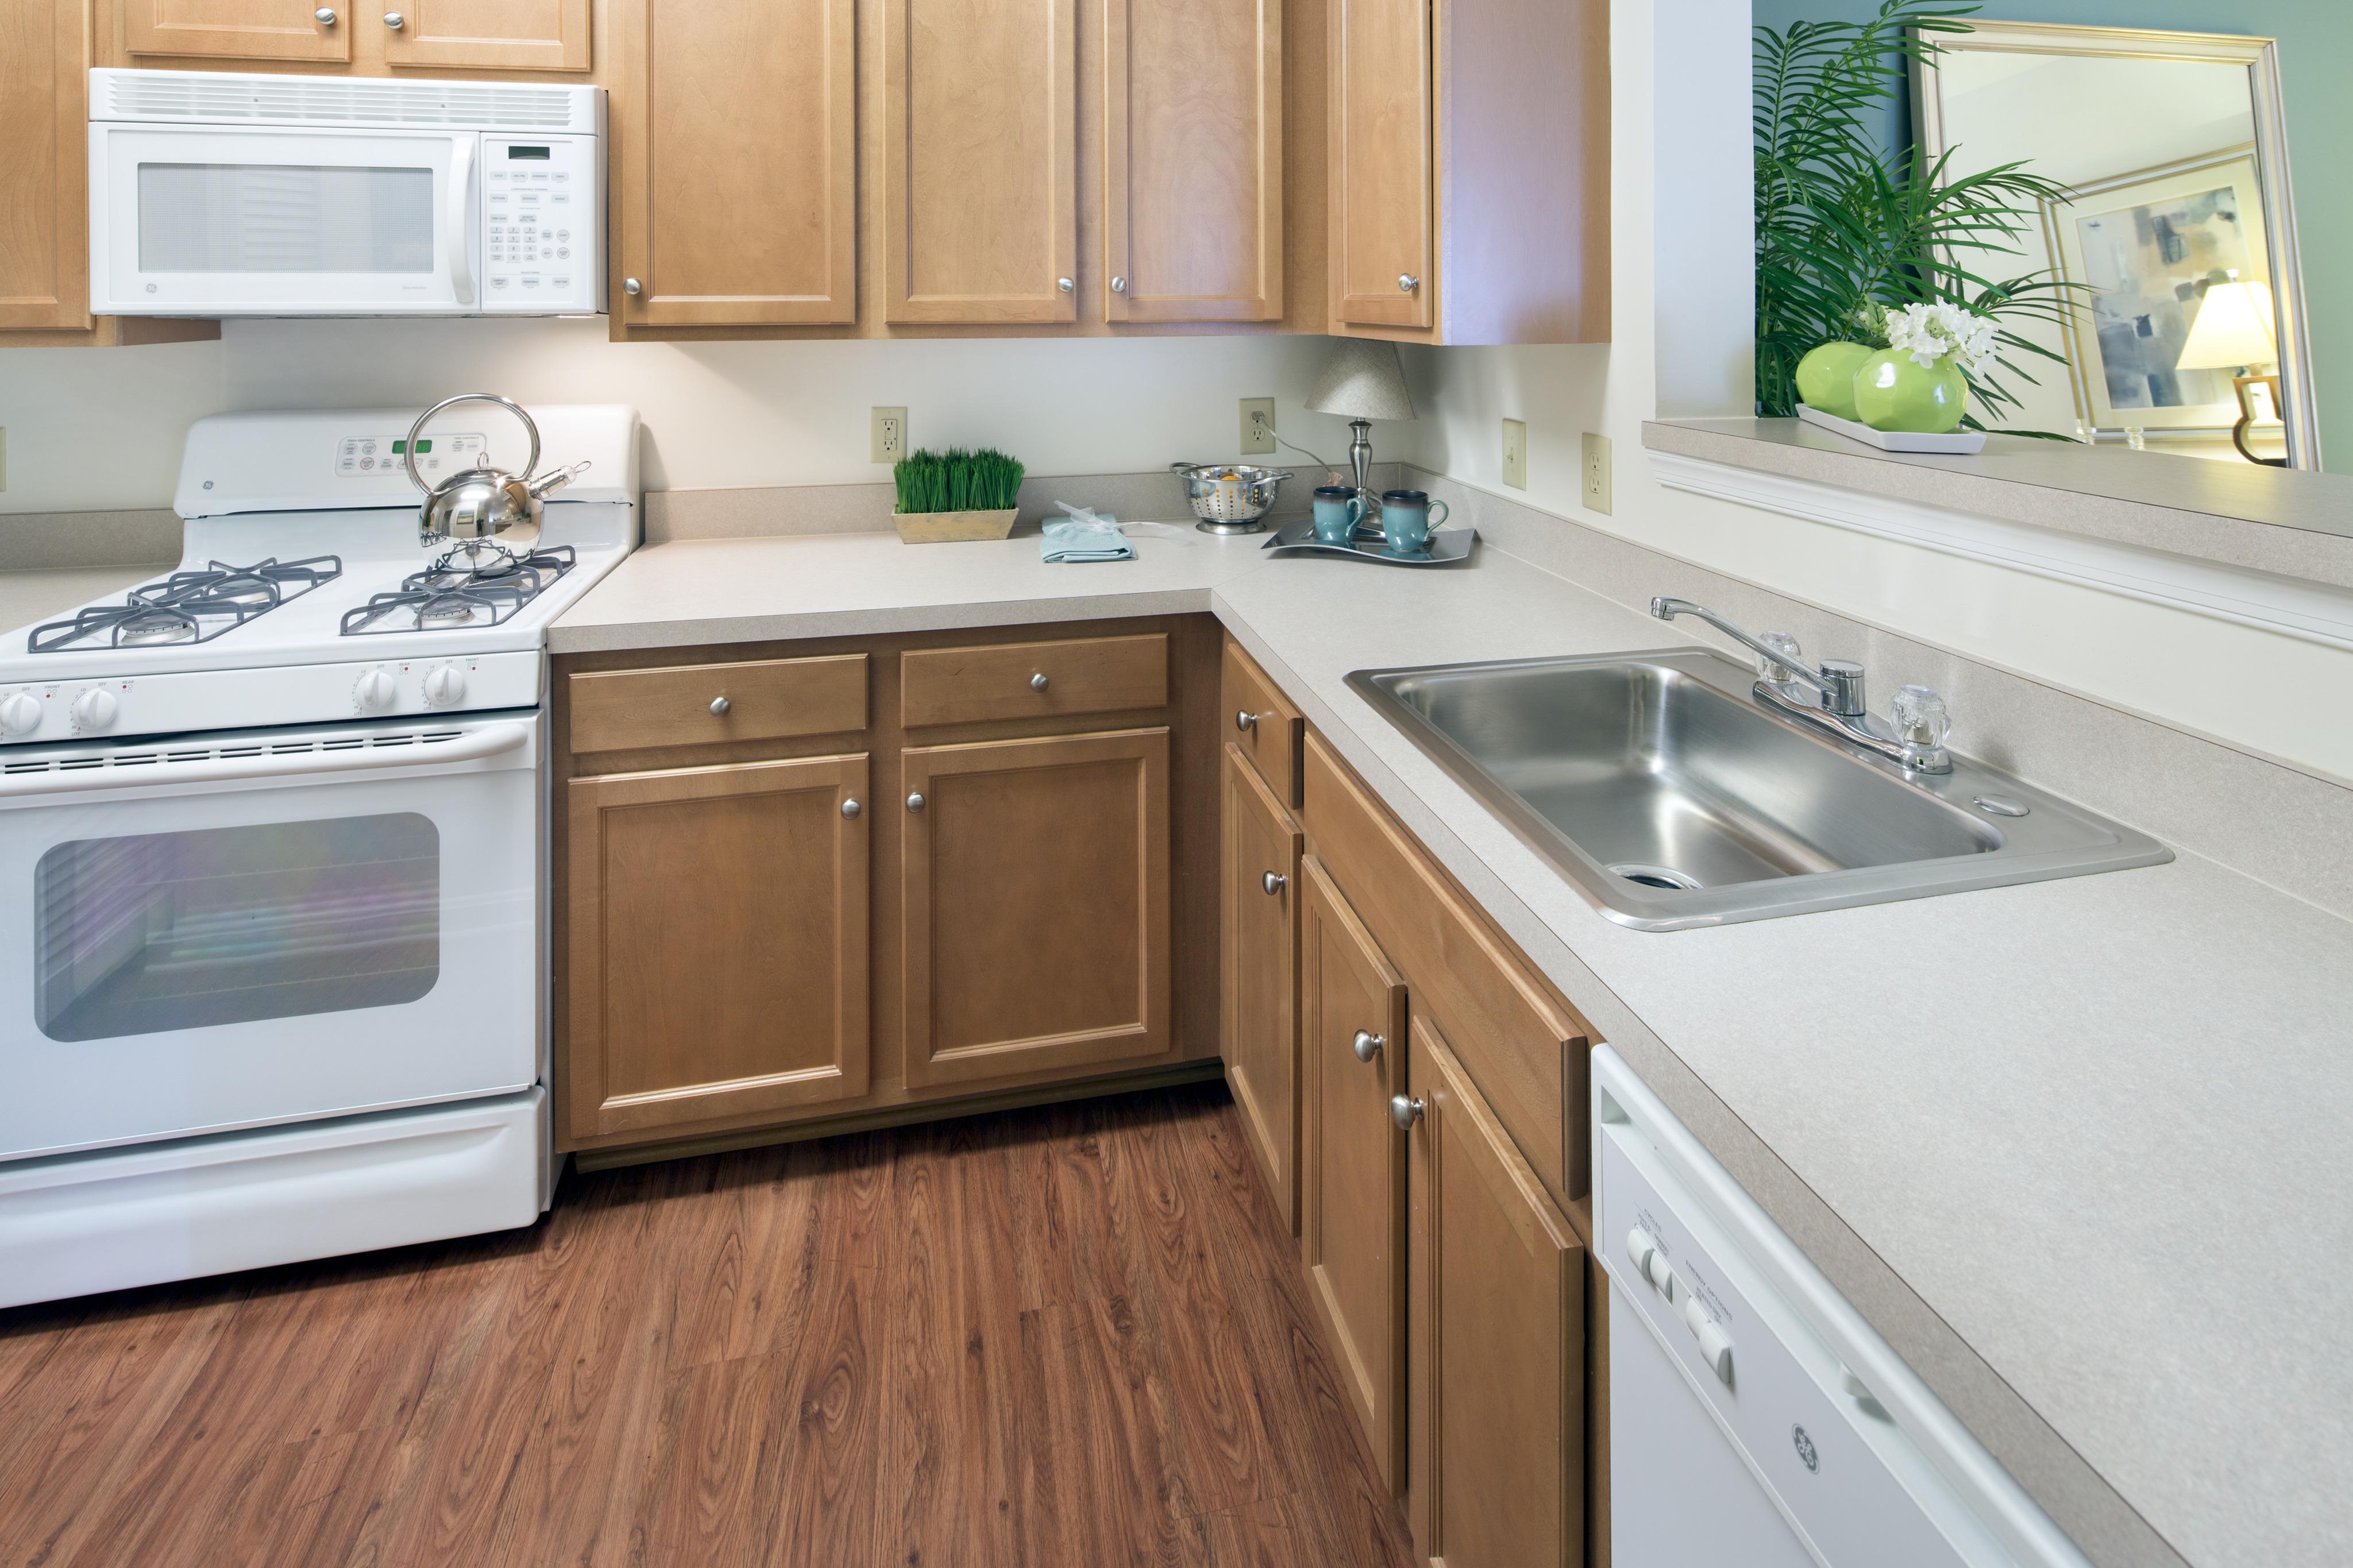 Apartments for Rent in Woodbridge VA | Riverside Station ...